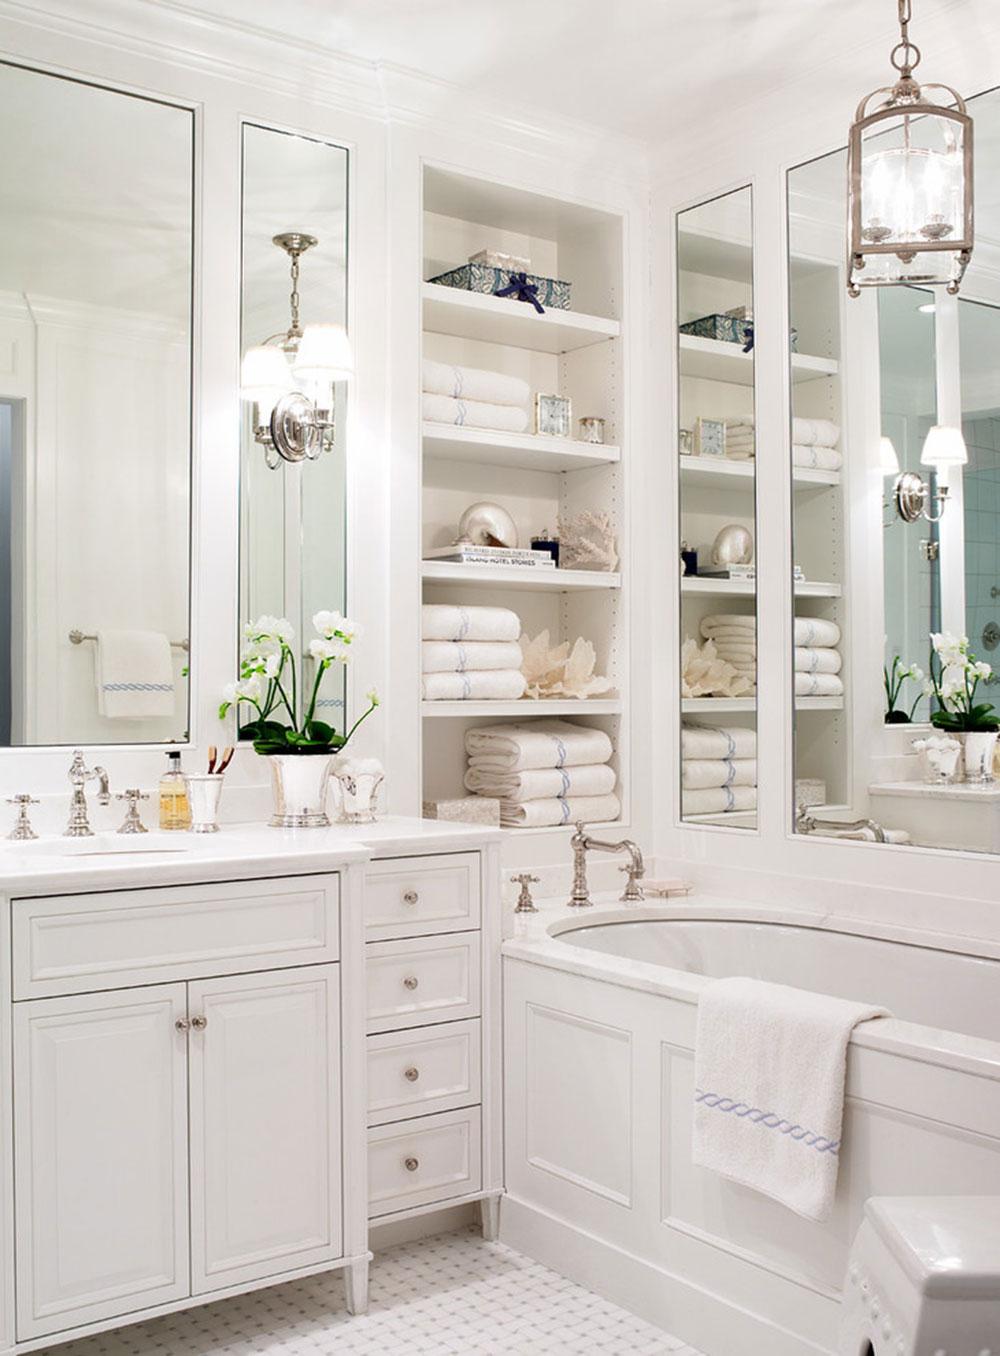 Small Bathroom Shelf Ideas To Optimize Your Bathroom Space